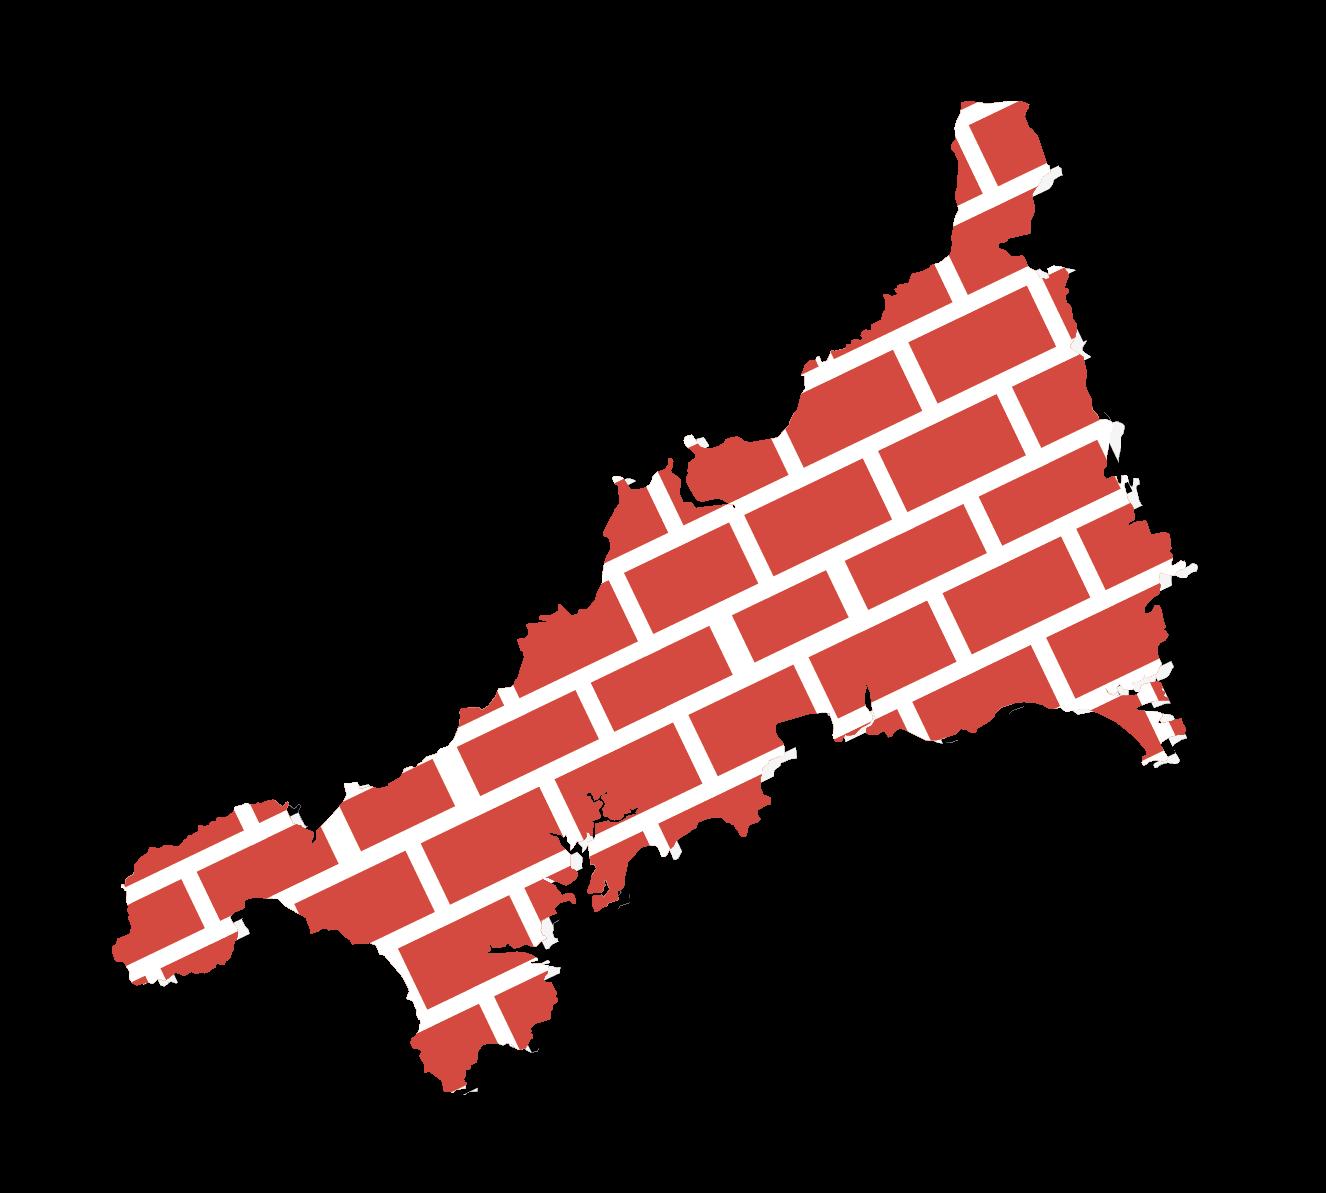 Transp. map 1